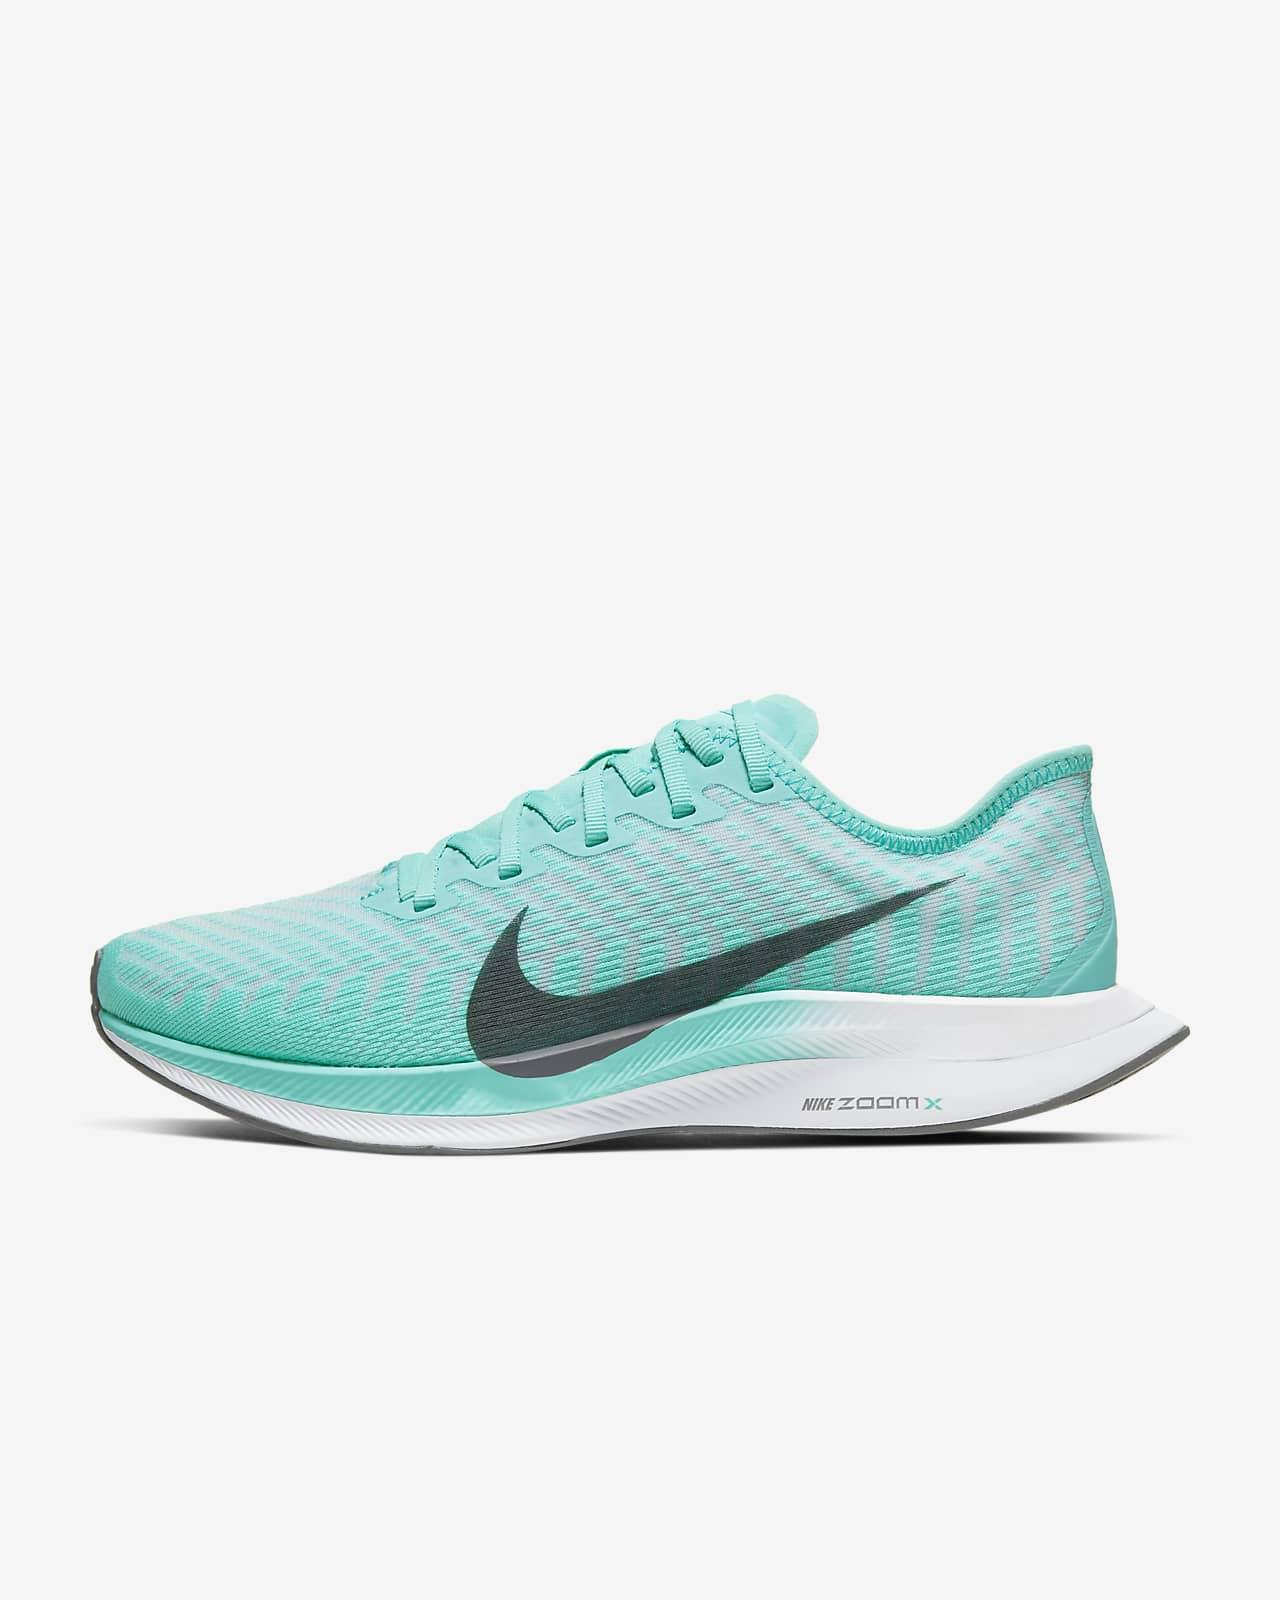 Nike Zoom Pegasus Turbo 2 女款跑鞋。Nike TW